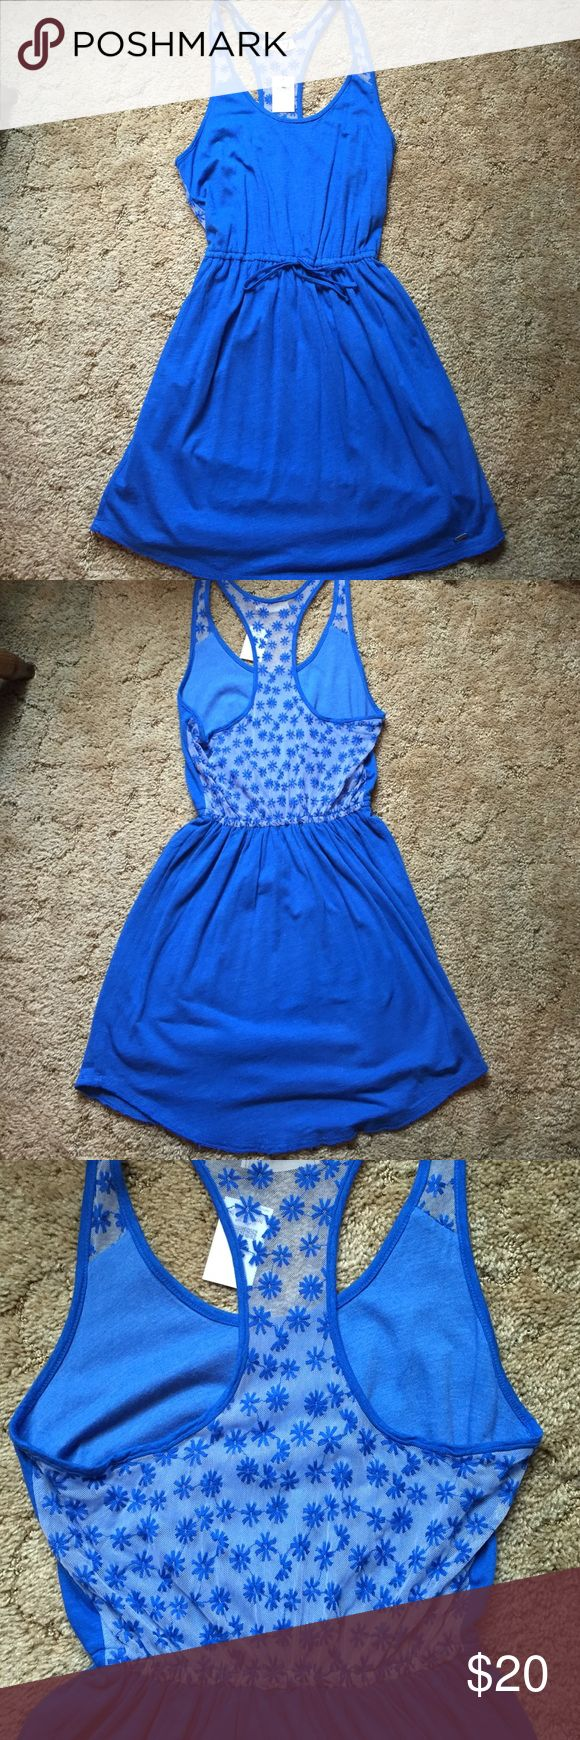 NWT Hollister dress Blue Hollister dress with flower detail. Two layers of skirt Hollister Dresses